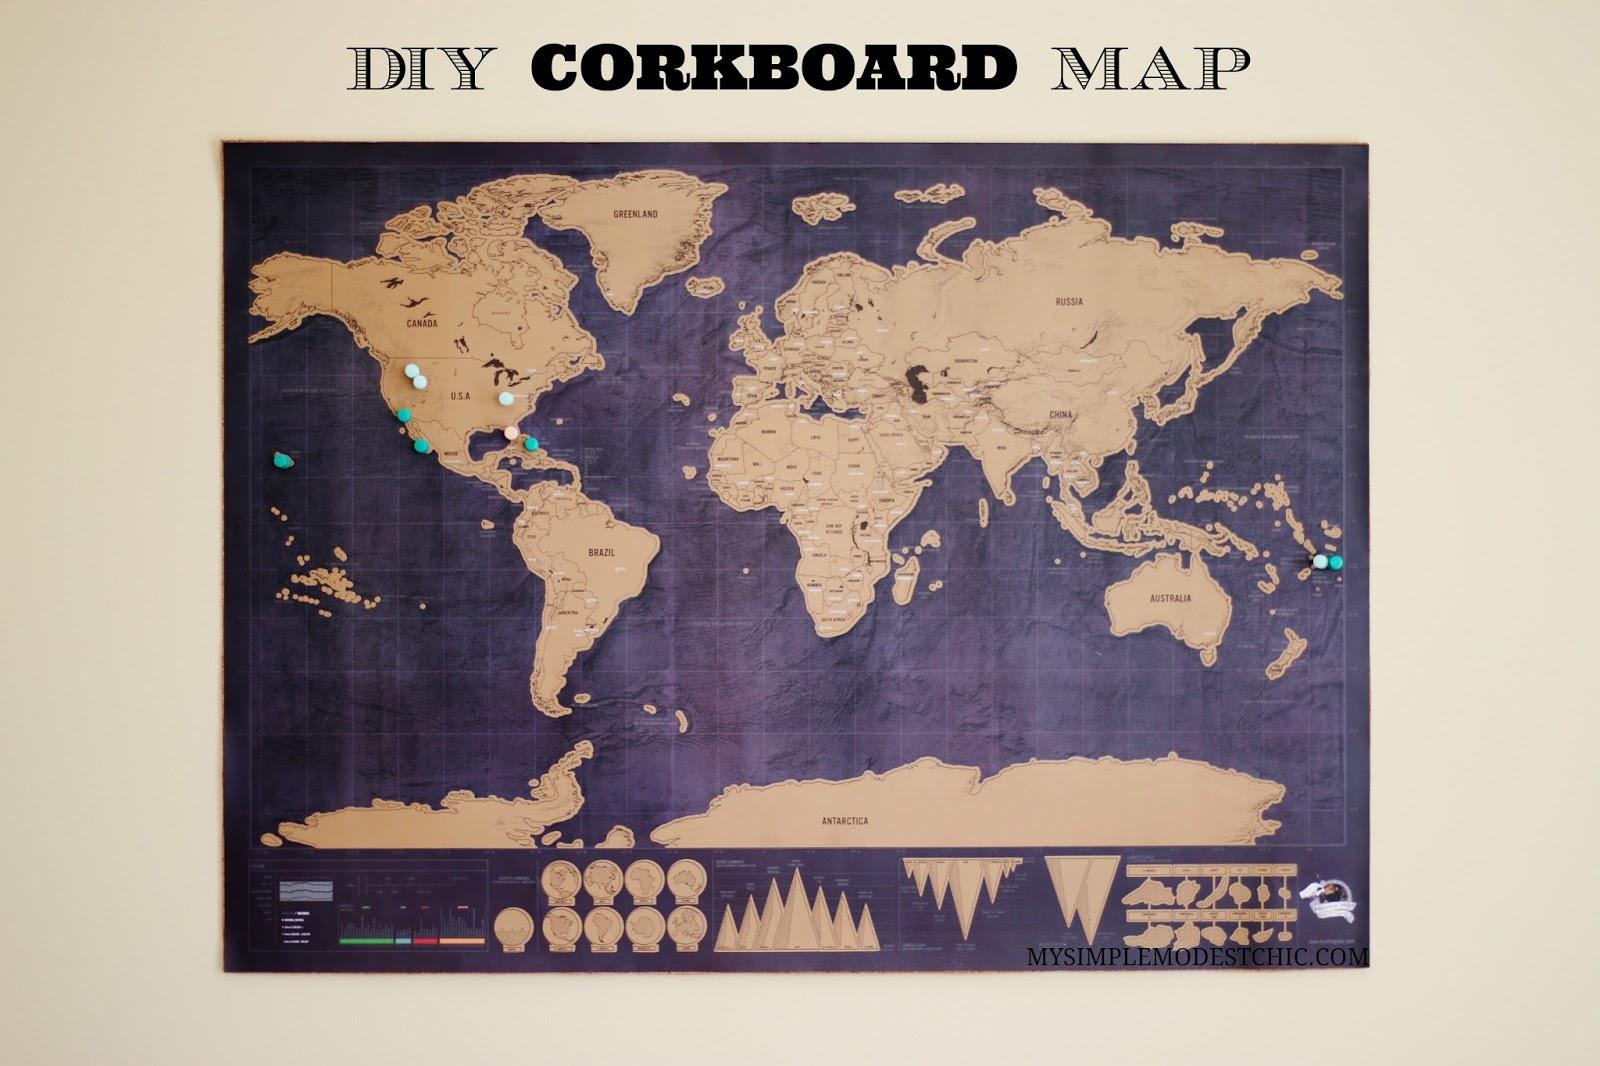 My Simple Modest Chic: Easiest DIY Cork Board Map